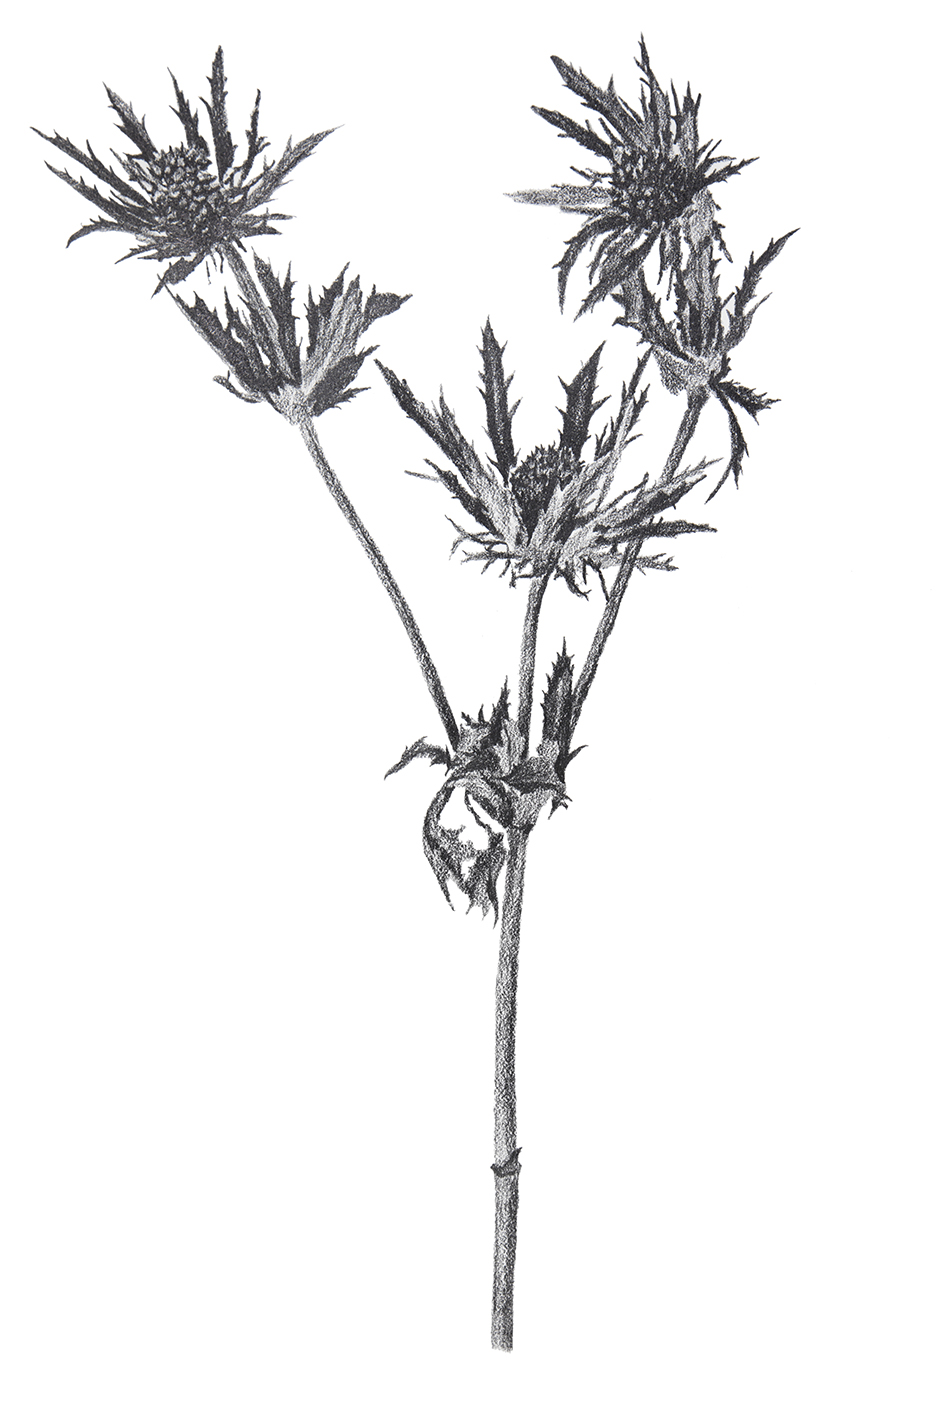 Flower Study 3 small.jpg